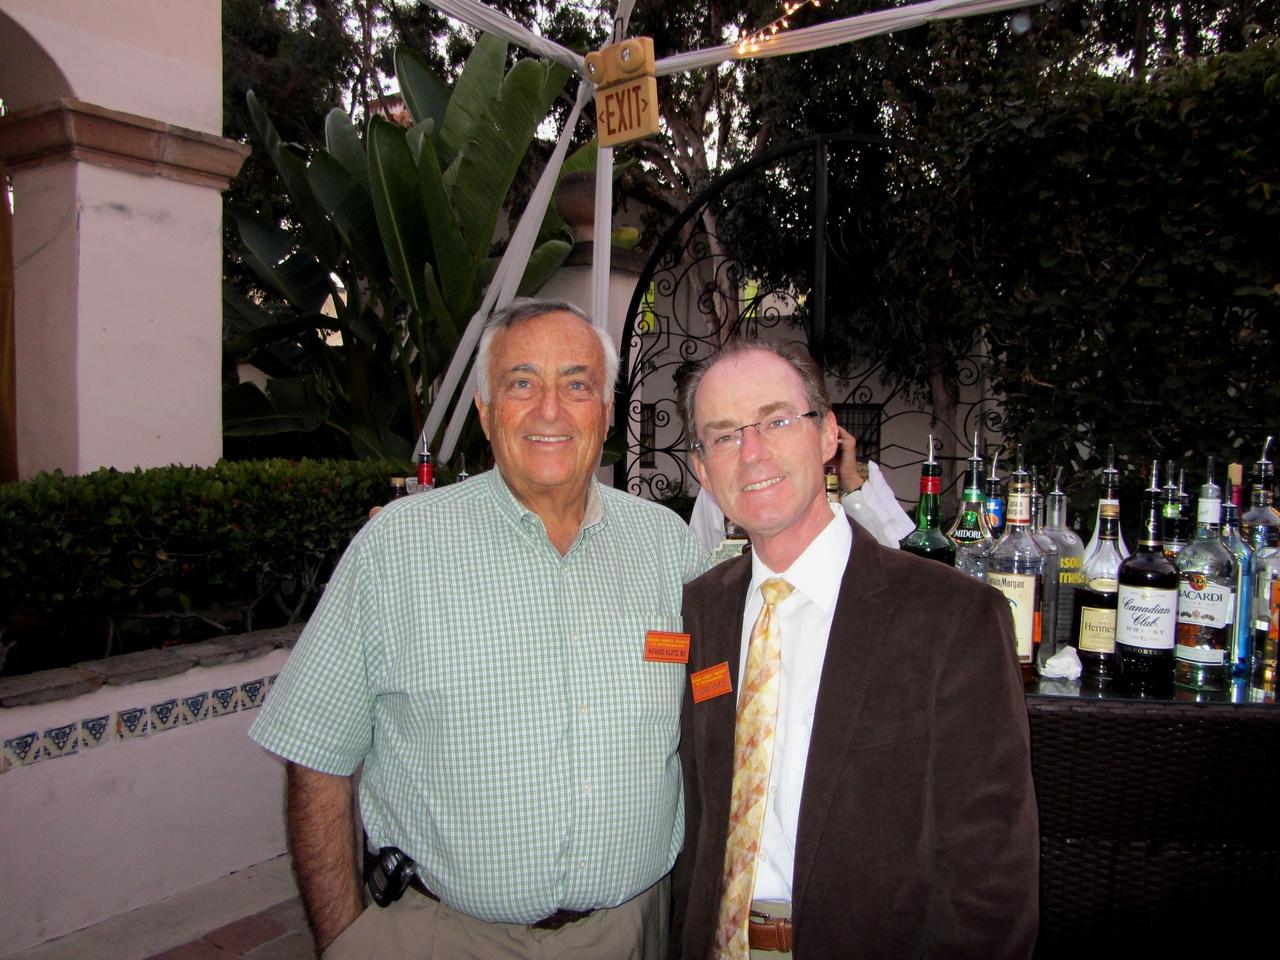 13 Dick Klotz & Andy Henrick